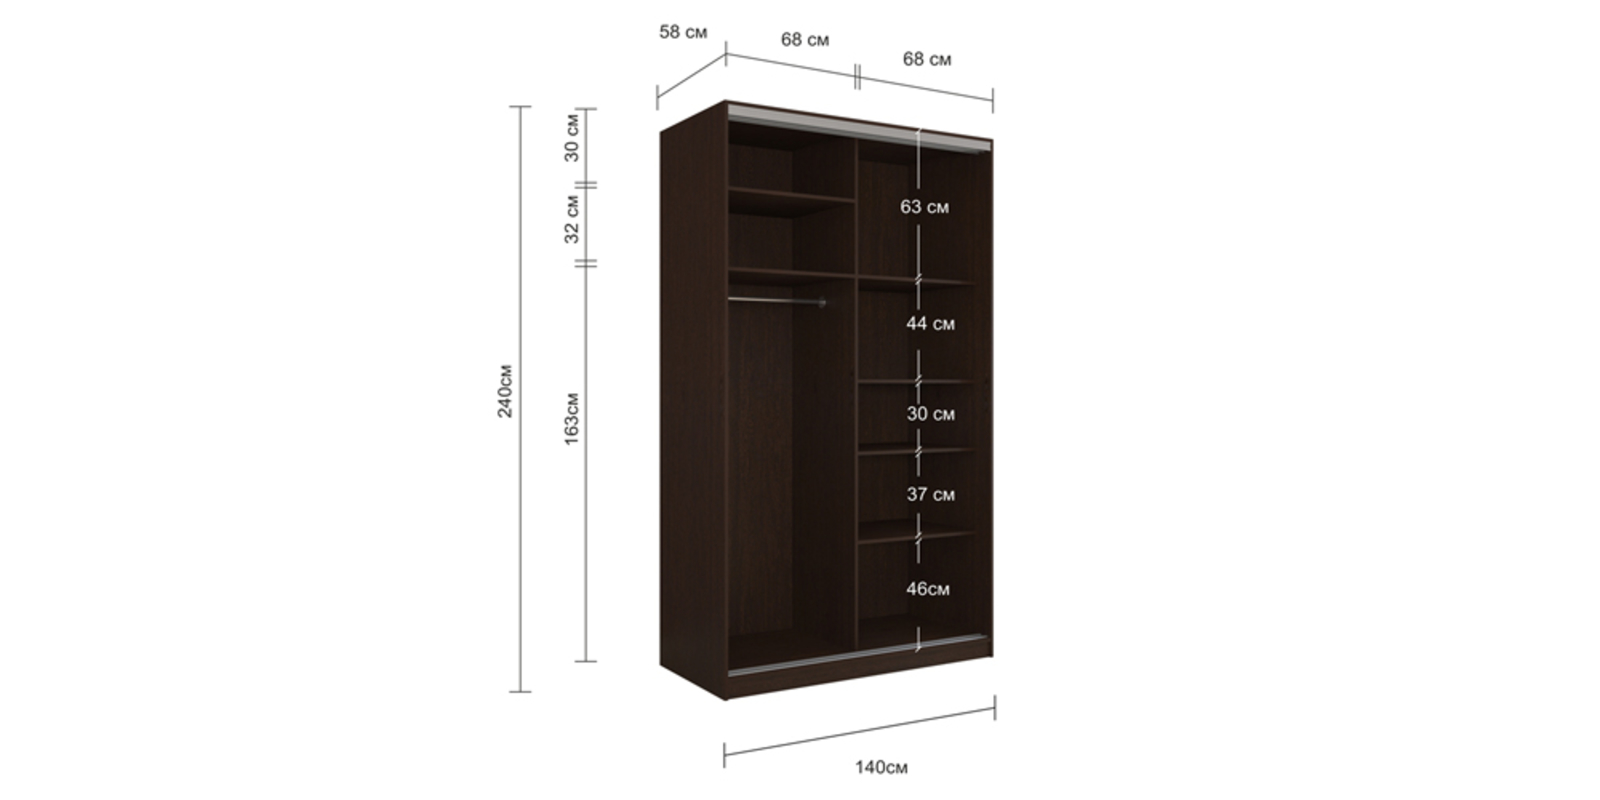 Шкаф-купе двухдверный Манхеттен 140 см (венге+зеркало)